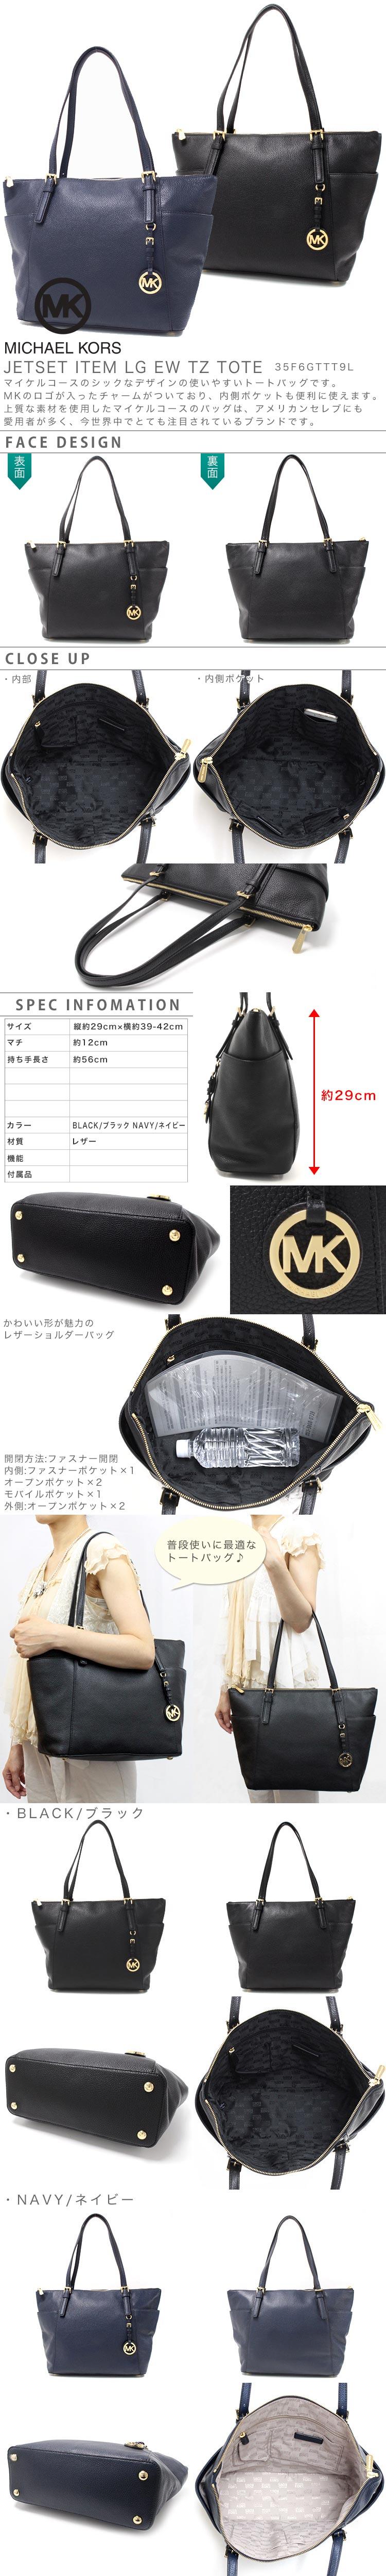 cfc17edc13d5 MKcollection  Michael Kors tote bag women s MICHAEL KORS bag casual ...